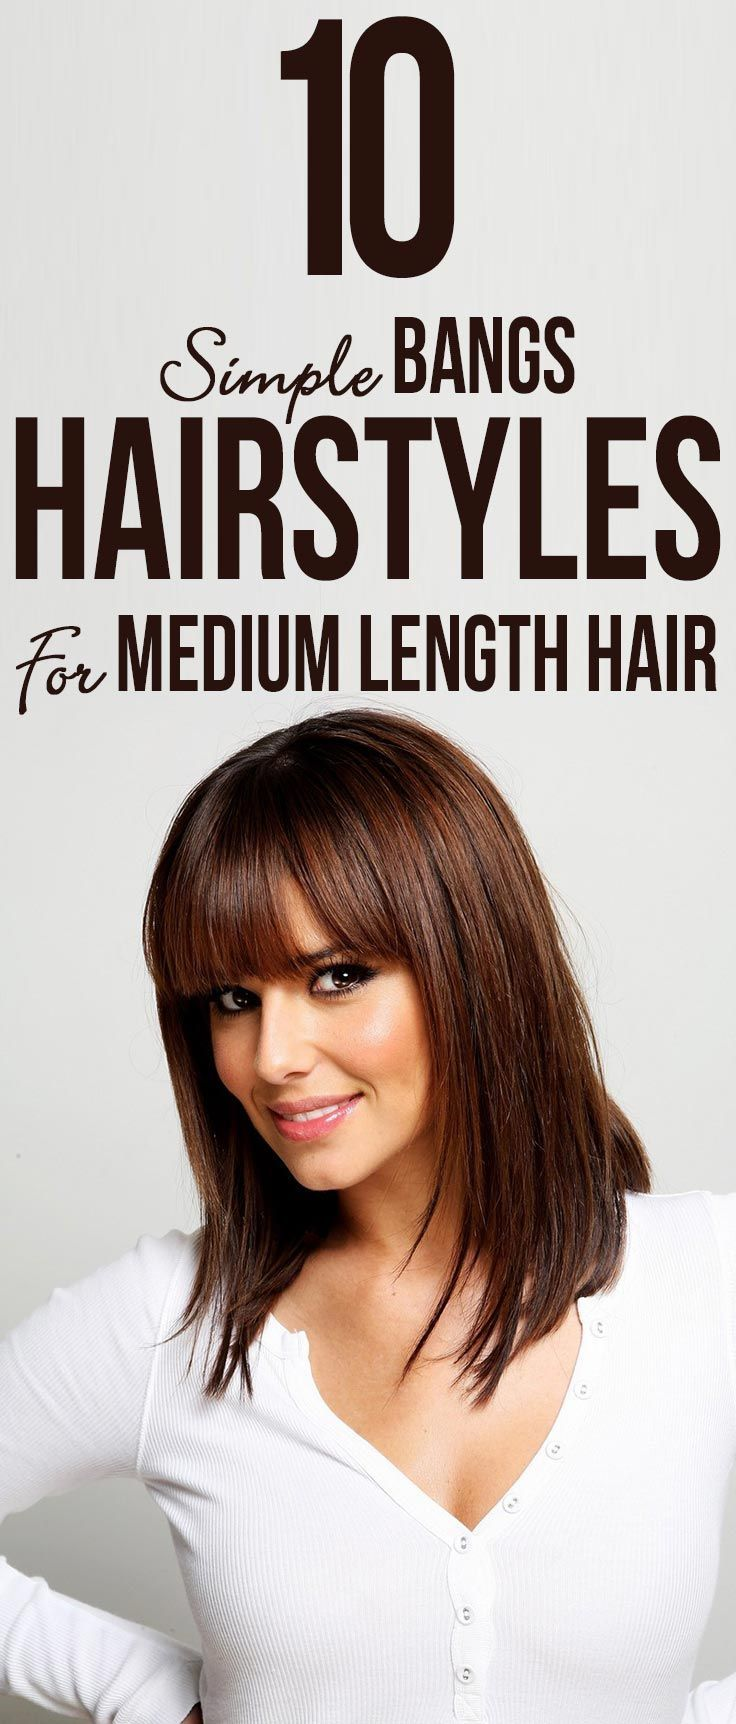 10 Simple Bangs Hairstyles For Medium Length Hair